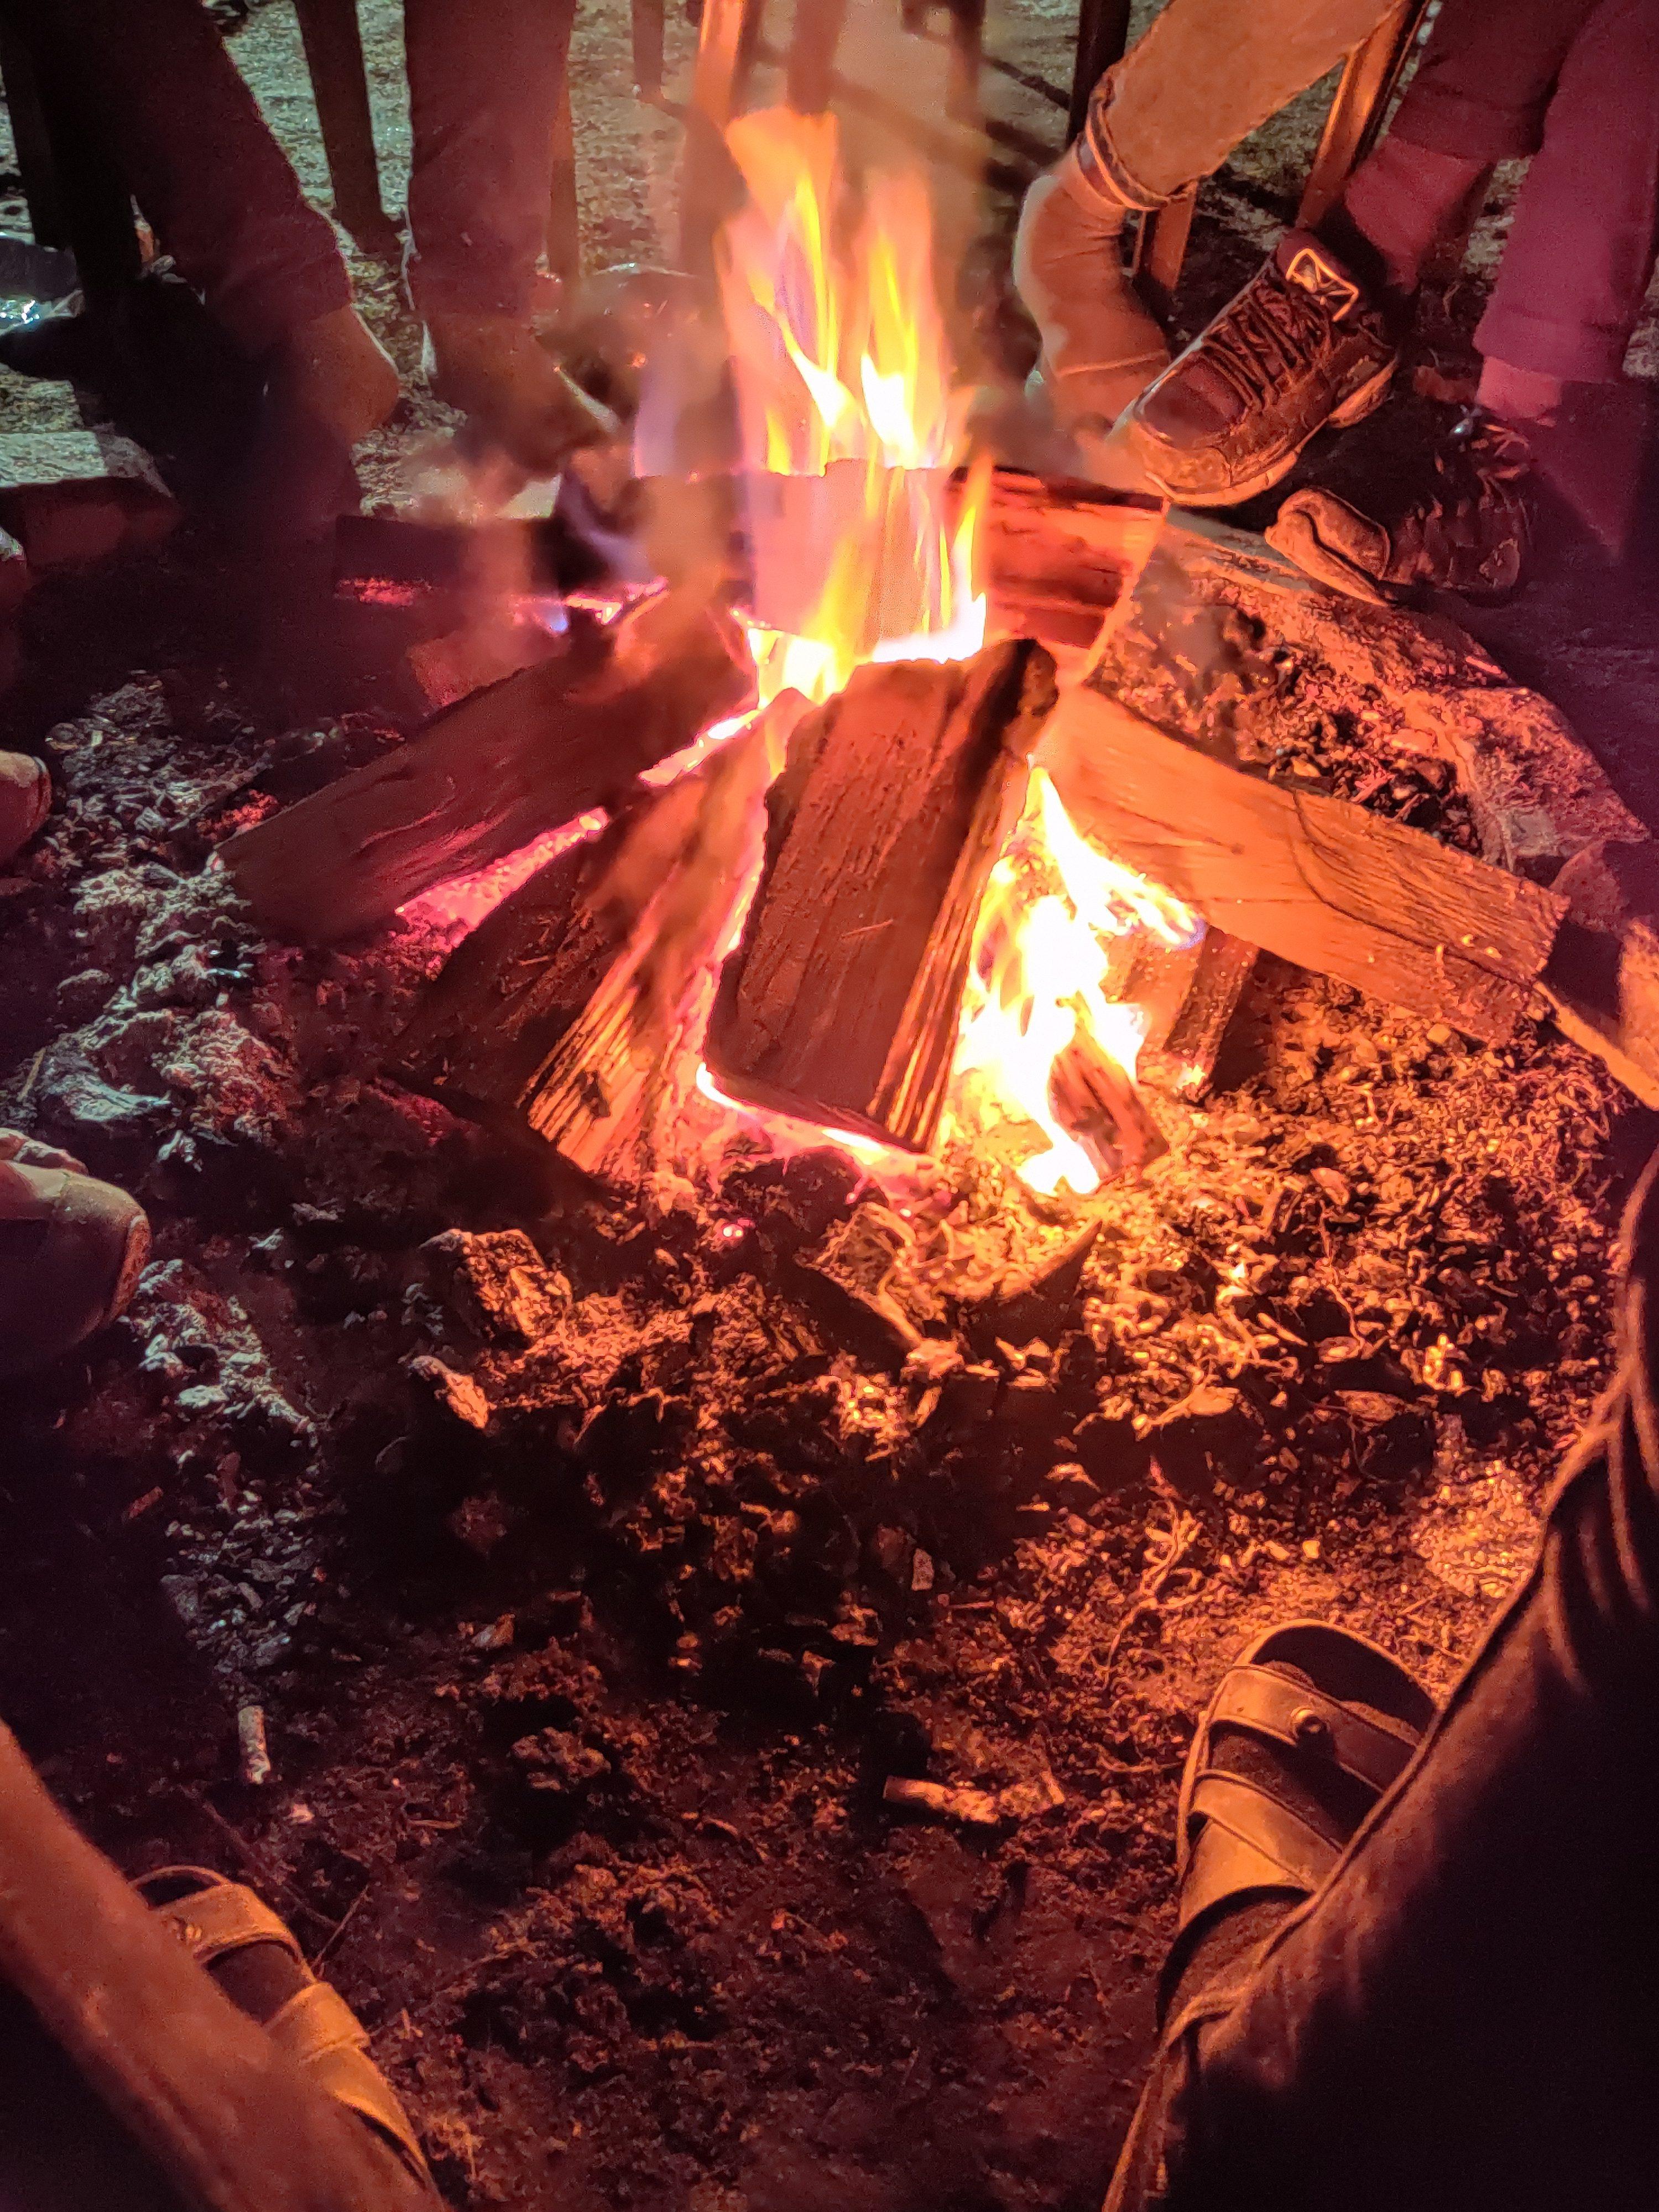 Campfire Image